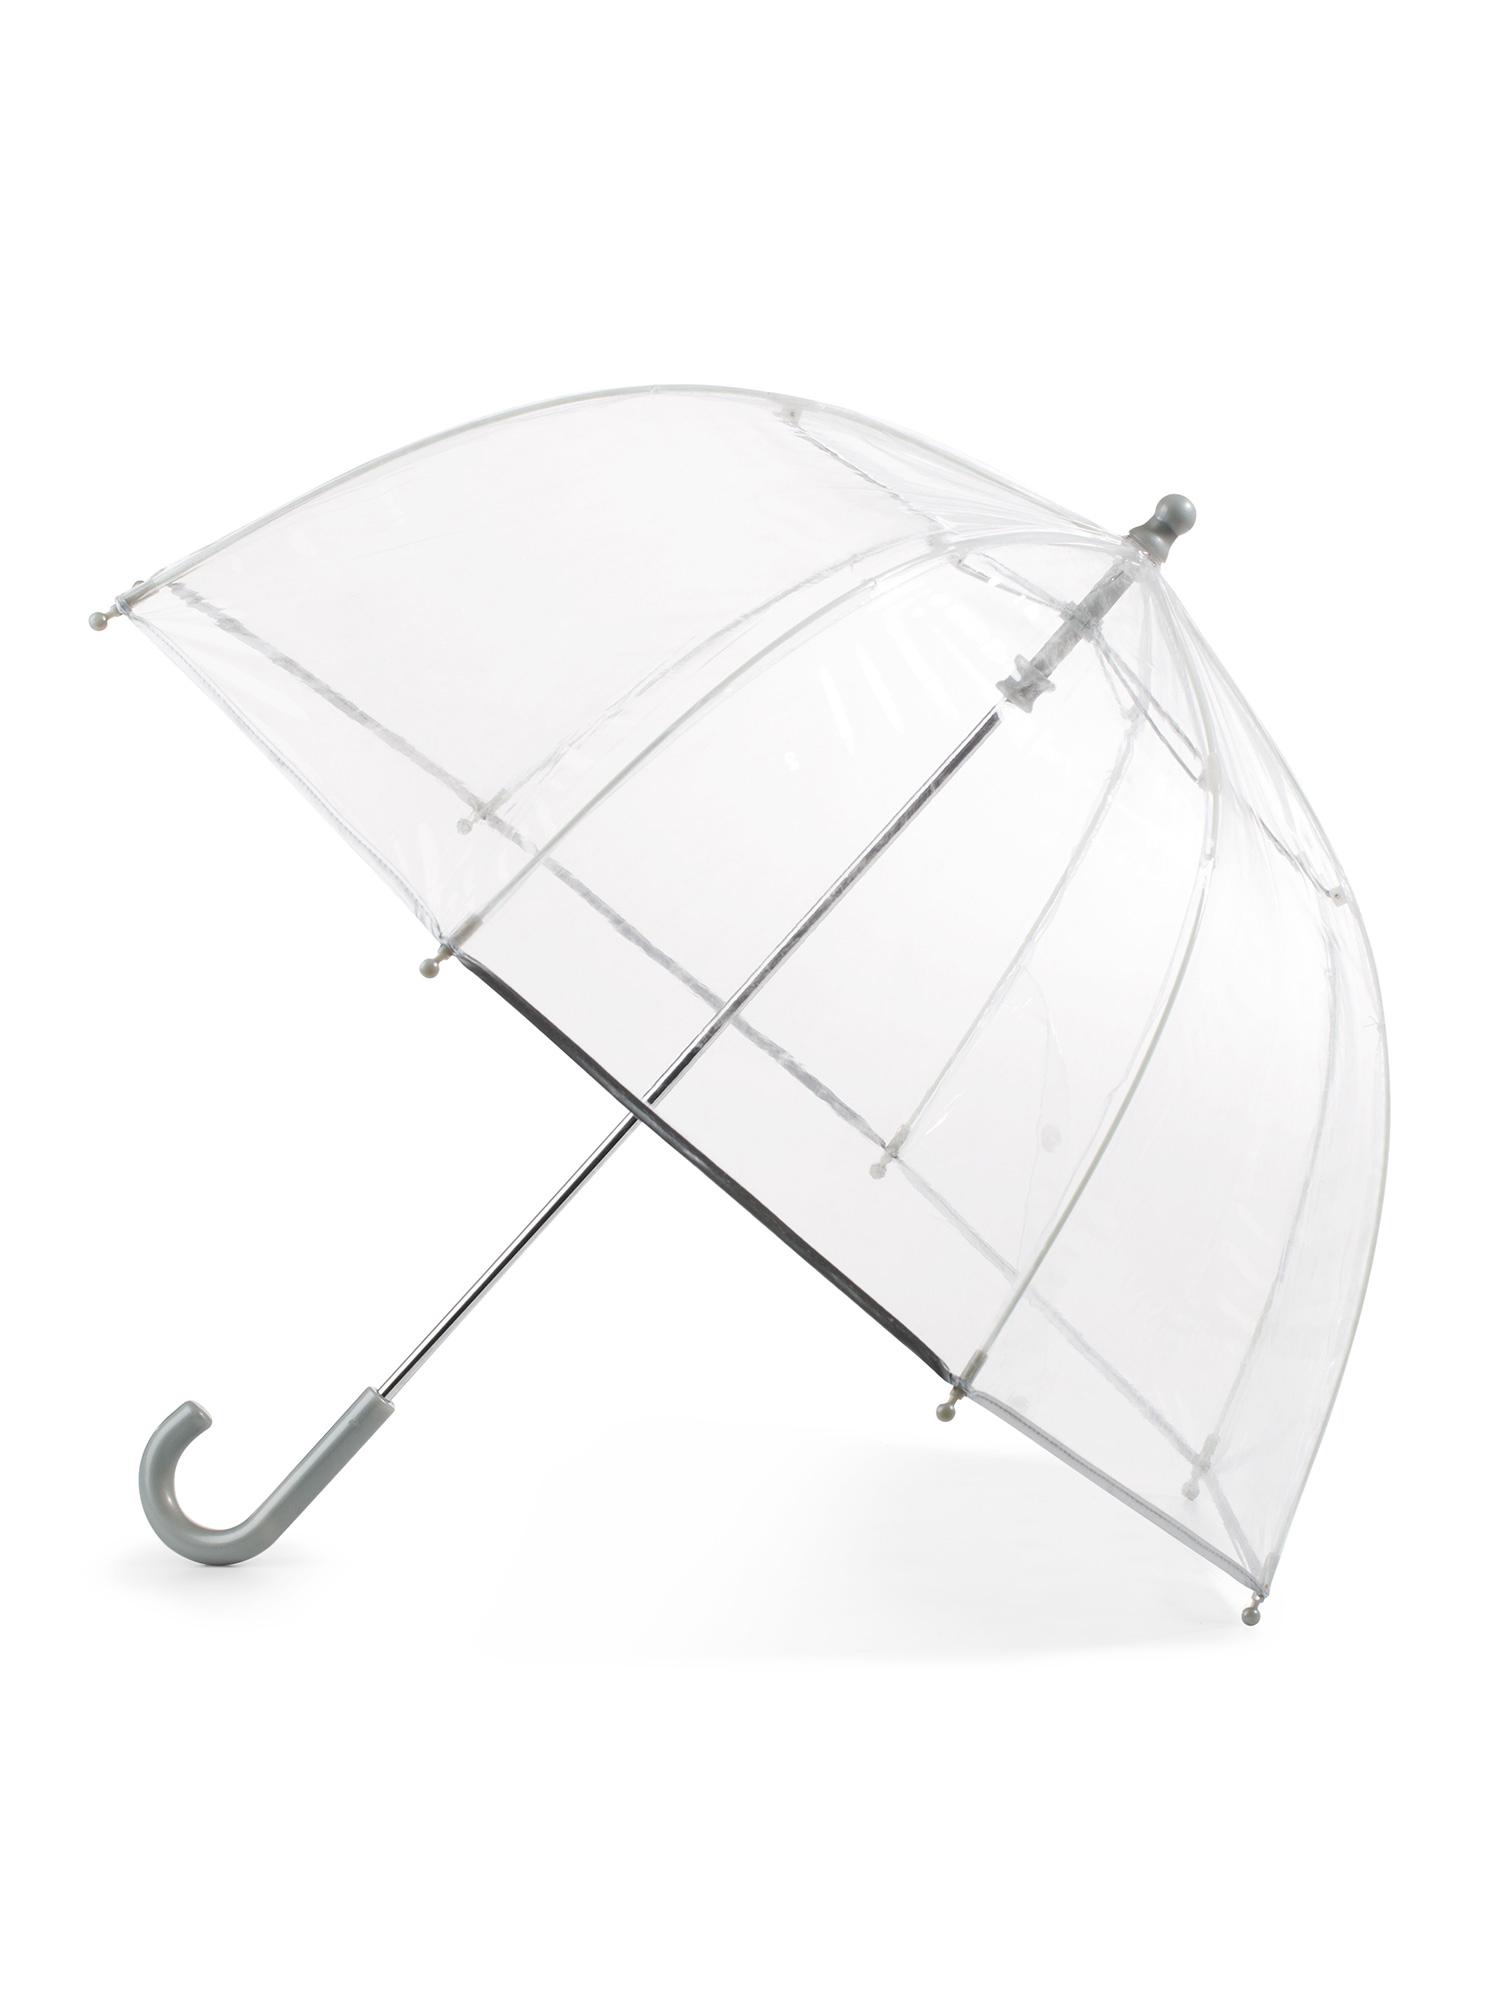 Kid's Bubble Umbrella with Easy Grip Handle